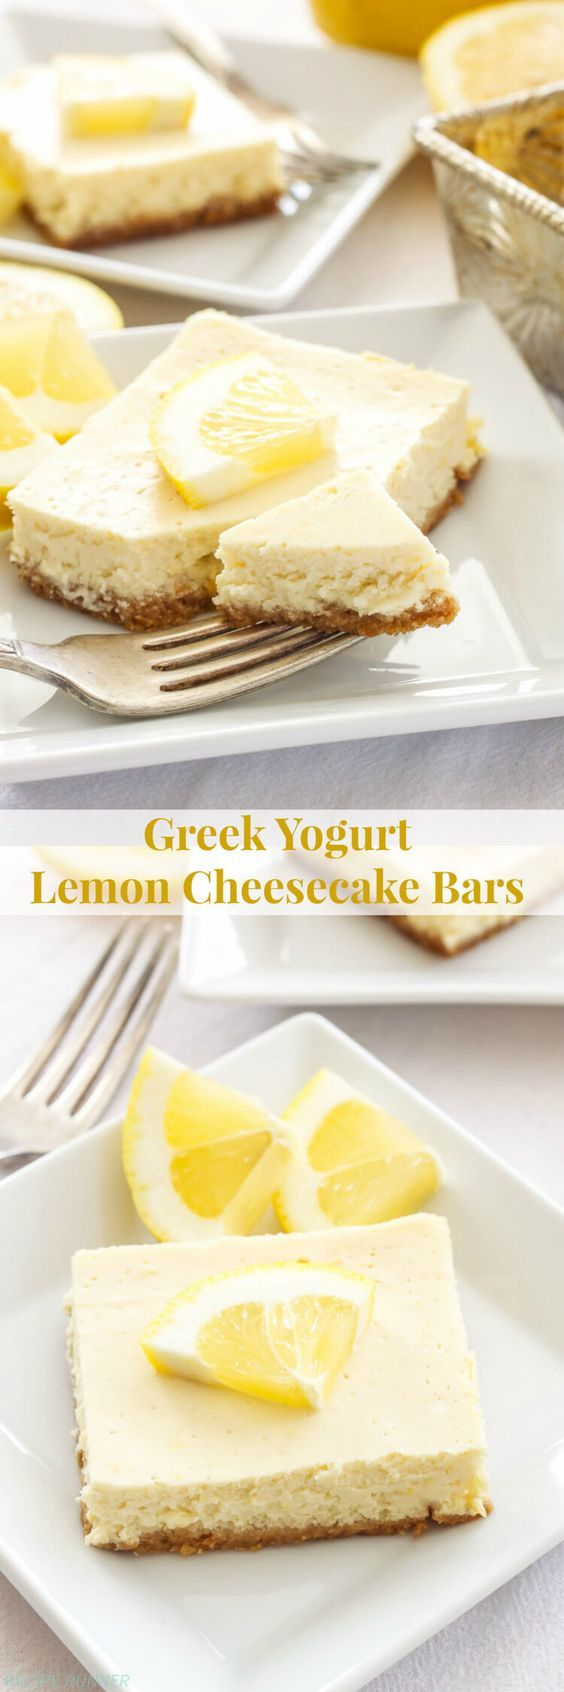 Greek Yogurt Lemon Cheesecake Bars are the perfect dessert to make this spring